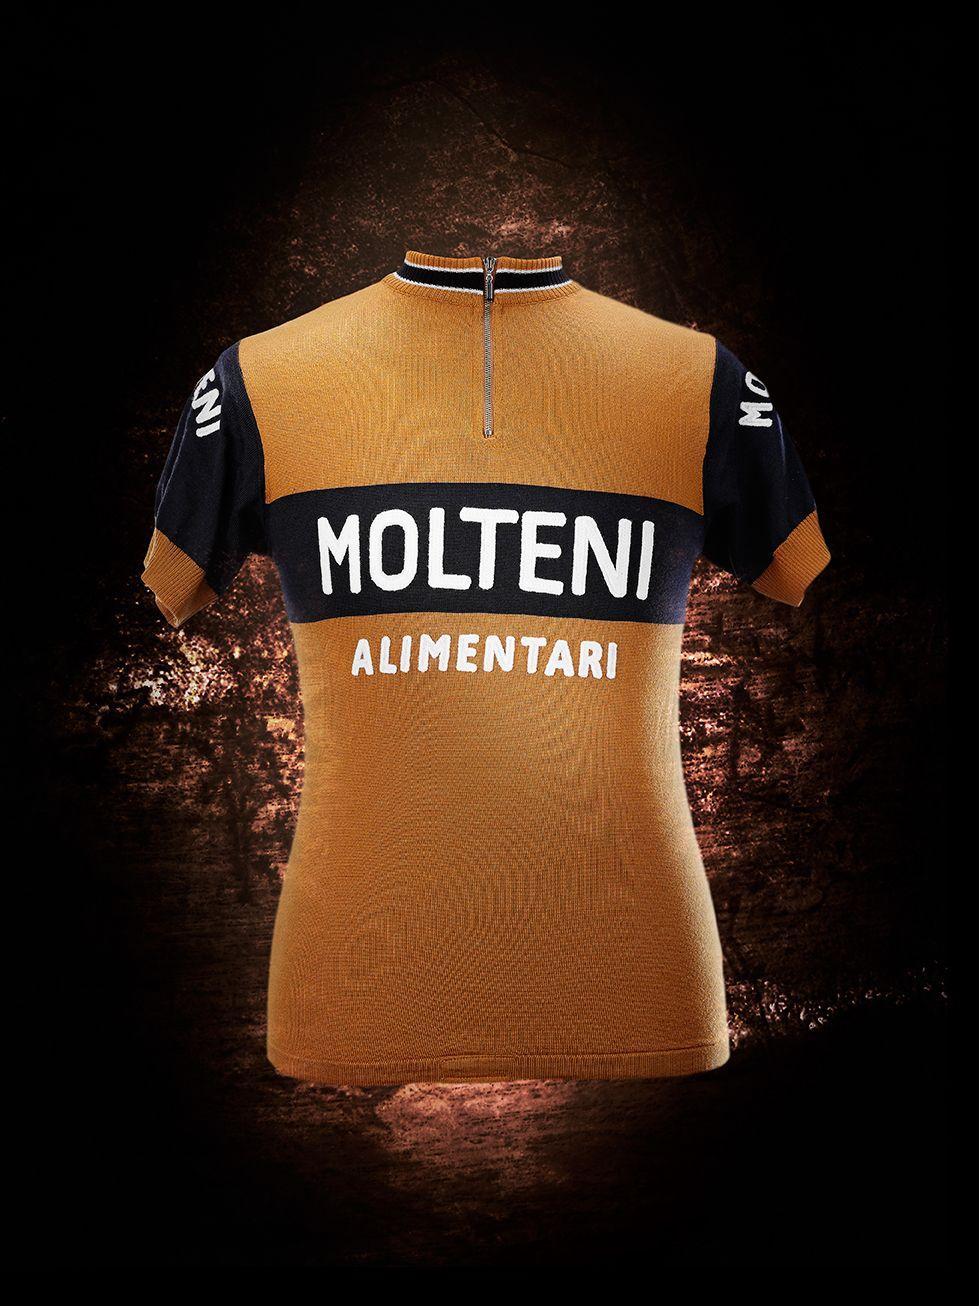 Molteni Team 1974  vintage  cycling  molteni  brooklyn  ciclismo   wielrennen  koers  cyclisme  maillot  koerstrui  eddymerckx  merckx   menswear  fashion ... 05fa868ef